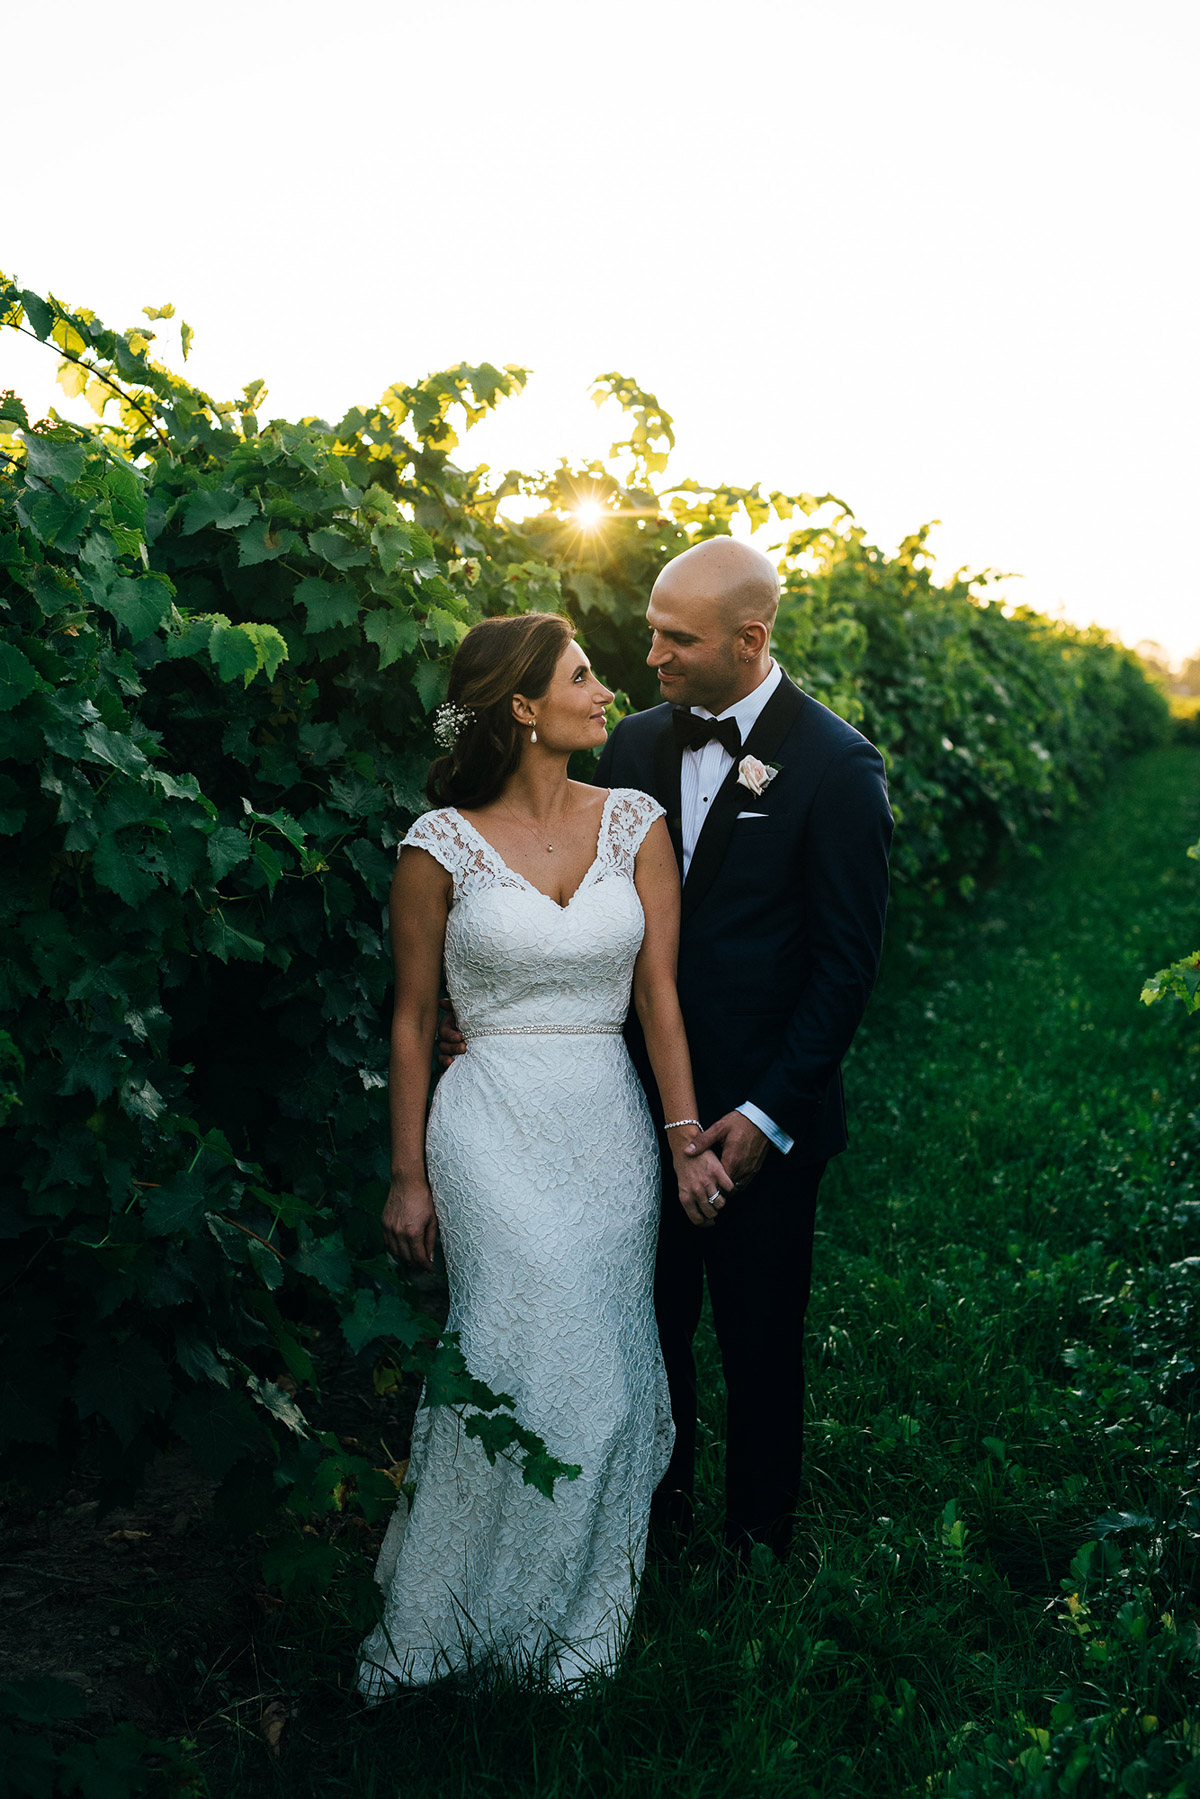 shaw-events-vineyard-bride-swish-list-kurtz-orchards-niagara-on-the-lake-wedding-53.jpg